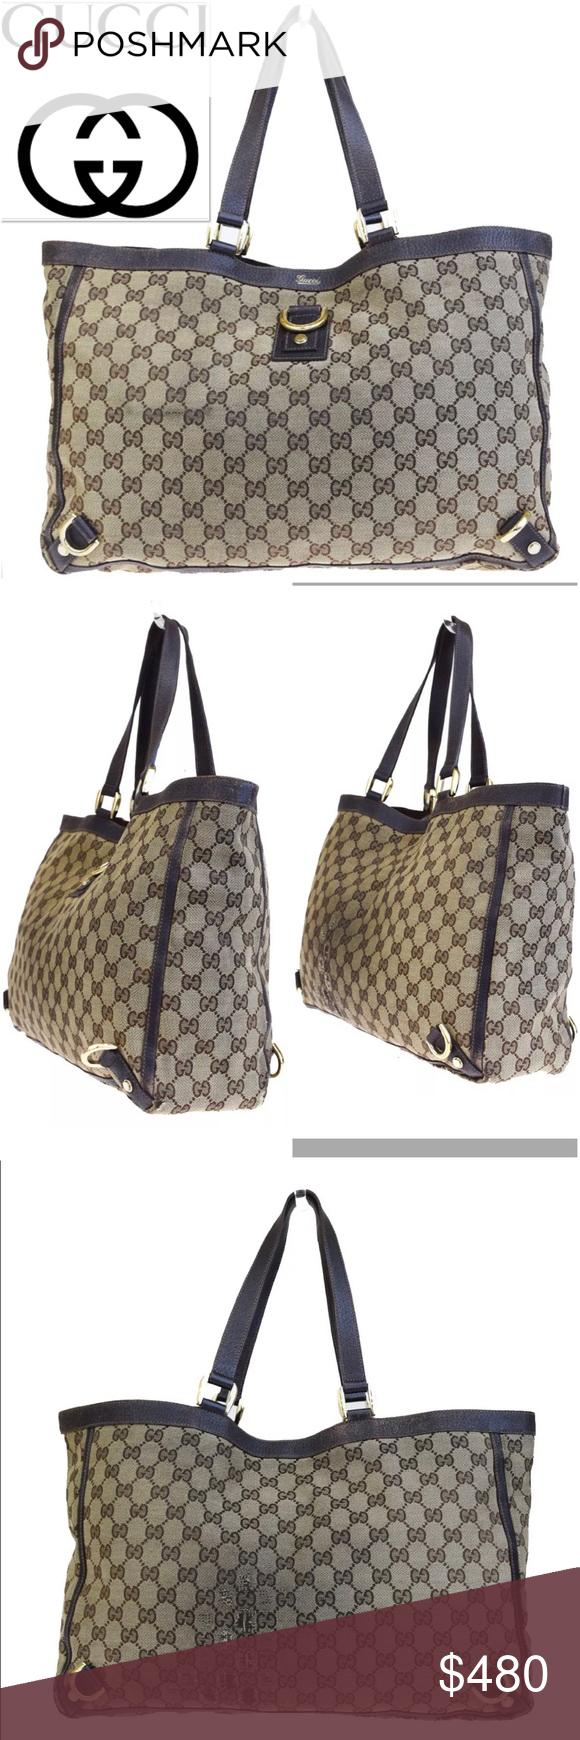 5dd4bfa194 GUCCI GG Shoulder Tote Canvas Leather Brown Bag Gucci GG Monogram Large Tote  Canvas Leather